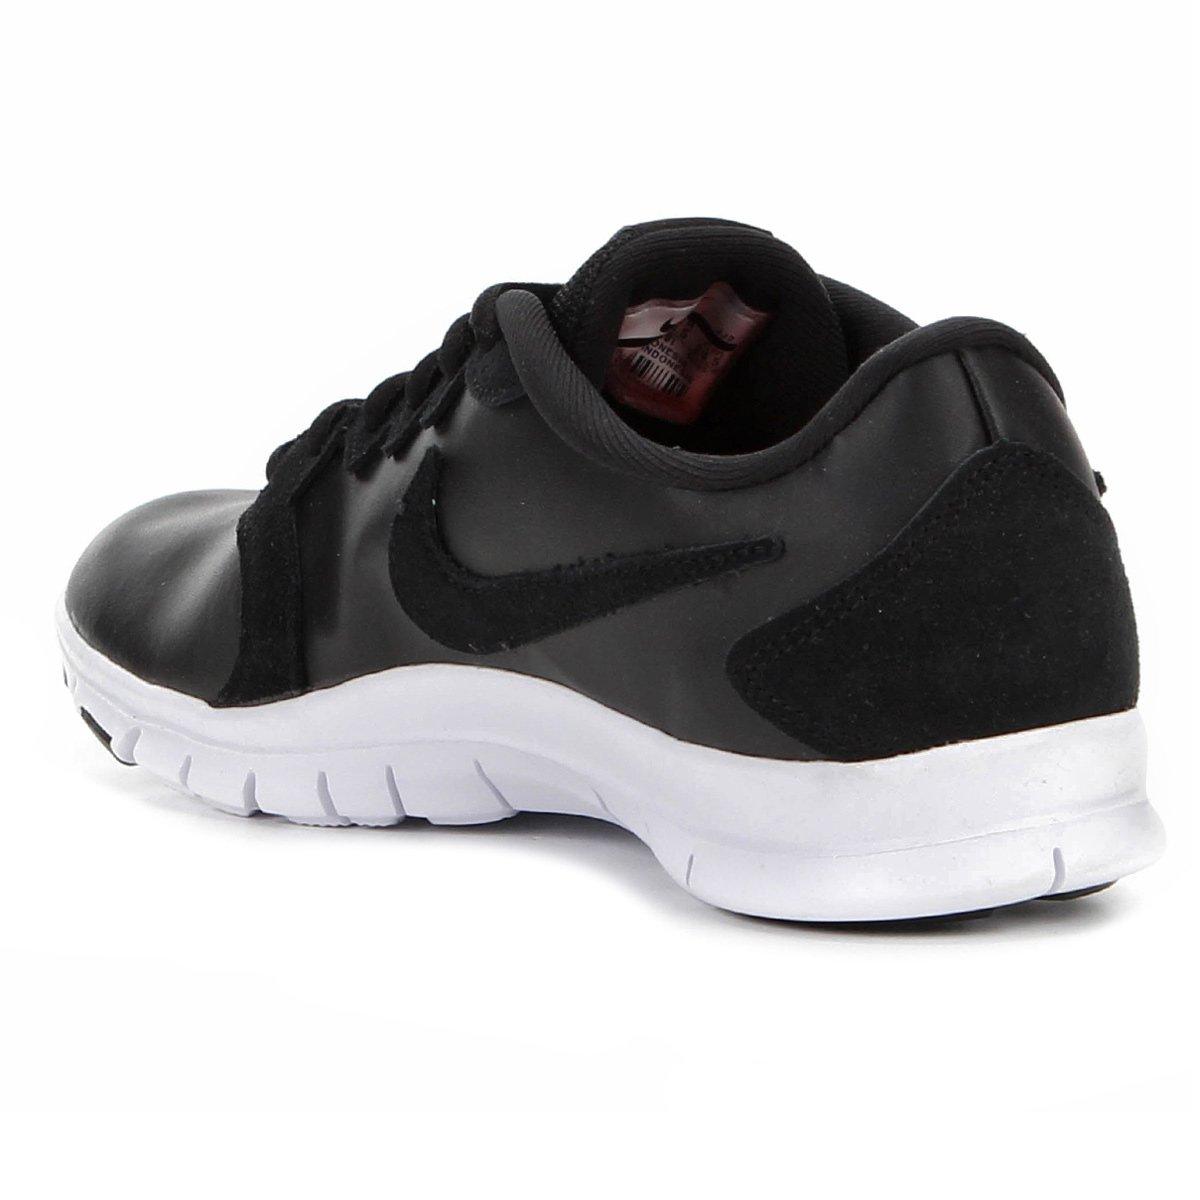 Tênis Nike Flex Essential Tr Lt Feminino - Preto e Branco - Compre ... 44c5b1214828f